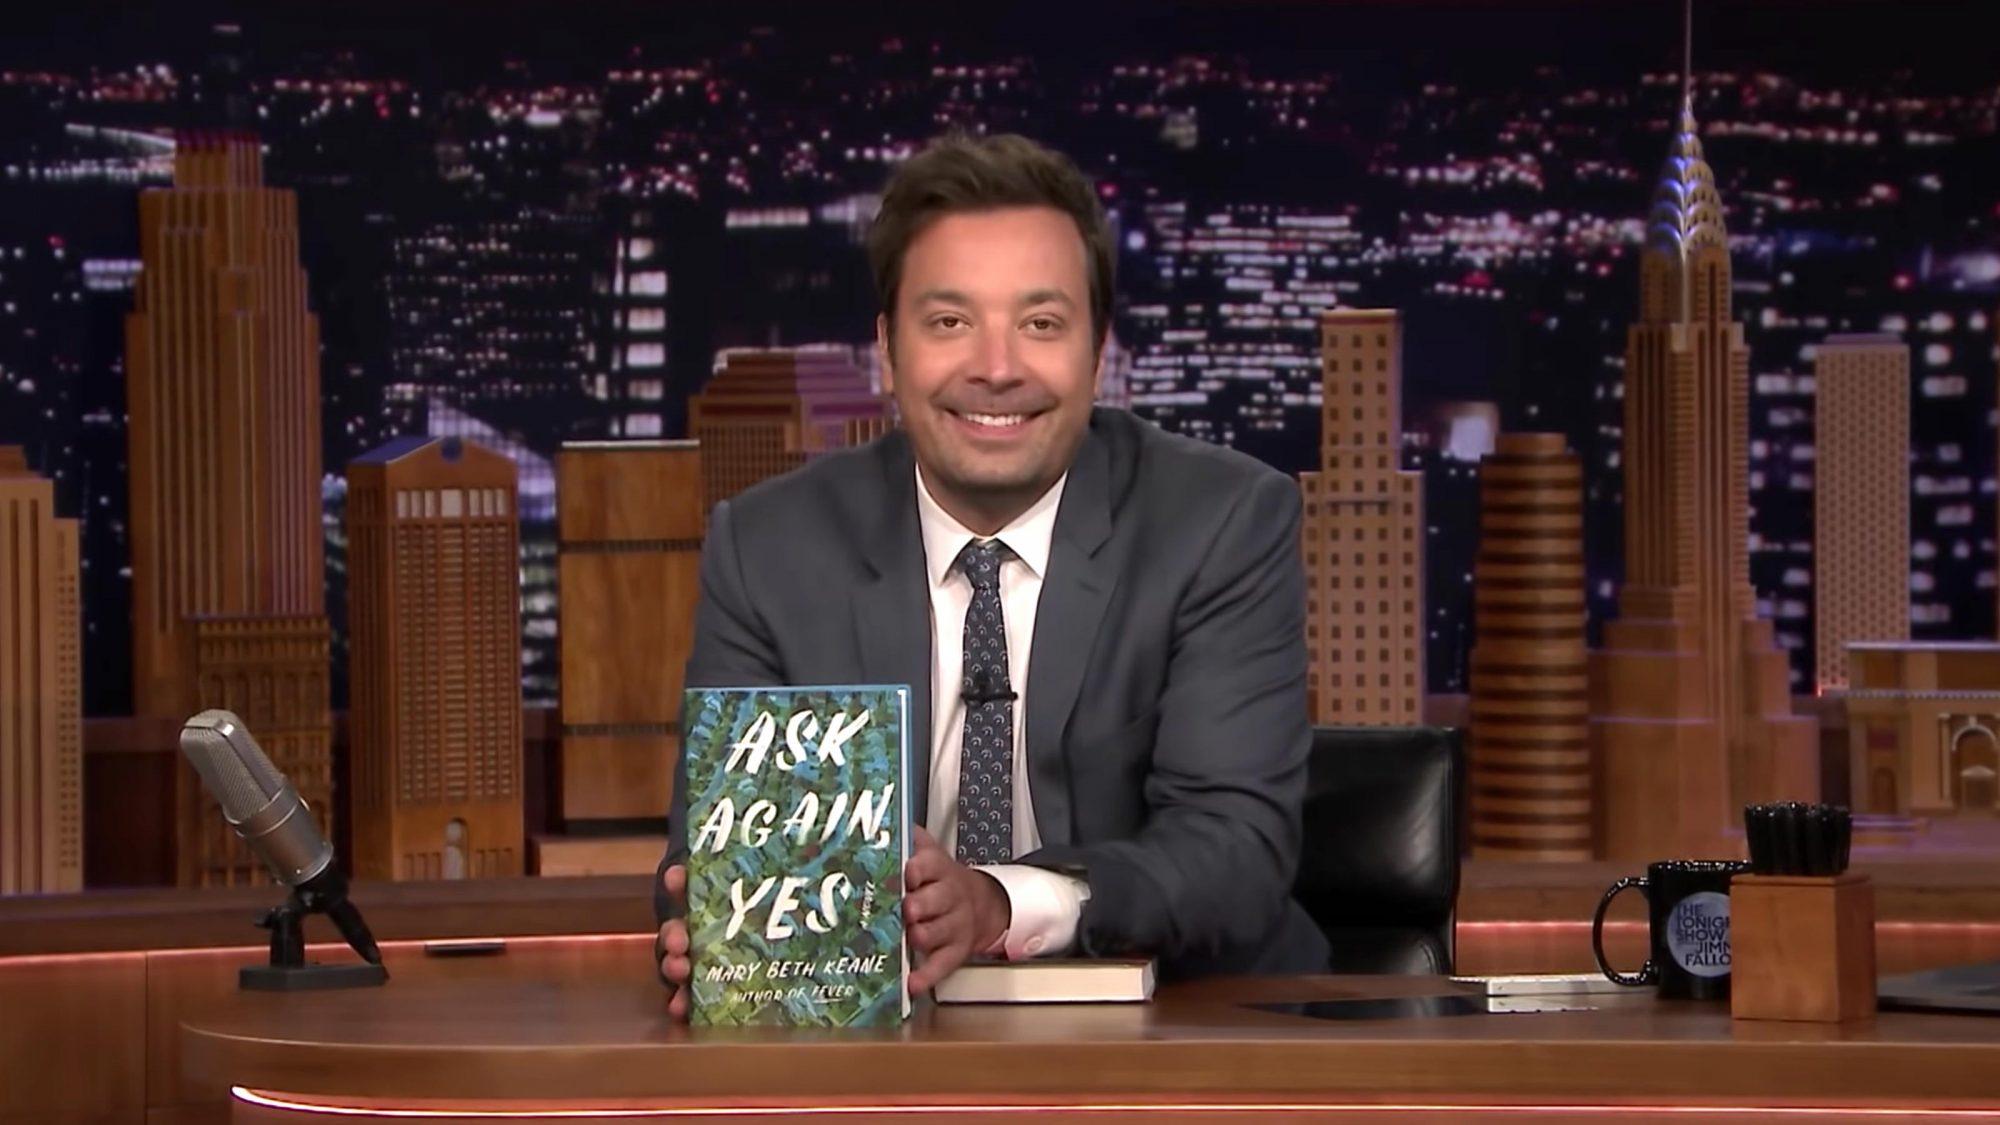 Jimmy Reveals the Tonight Show Summer Reads 2019 Winner (screen grab) https://www.youtube.com/watch?v=TprtqJP-sSM CR: NBC